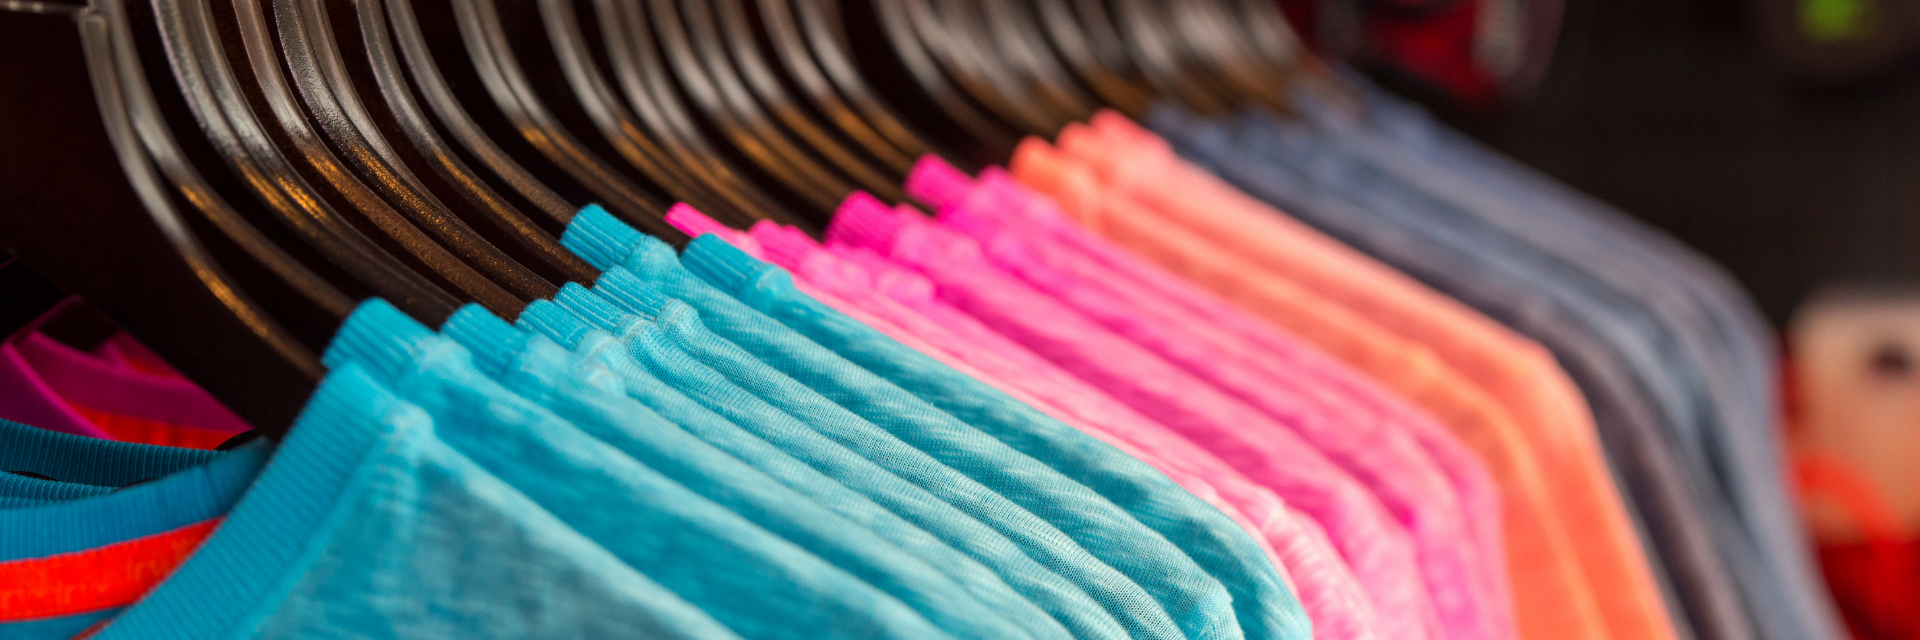 branza tekstylna